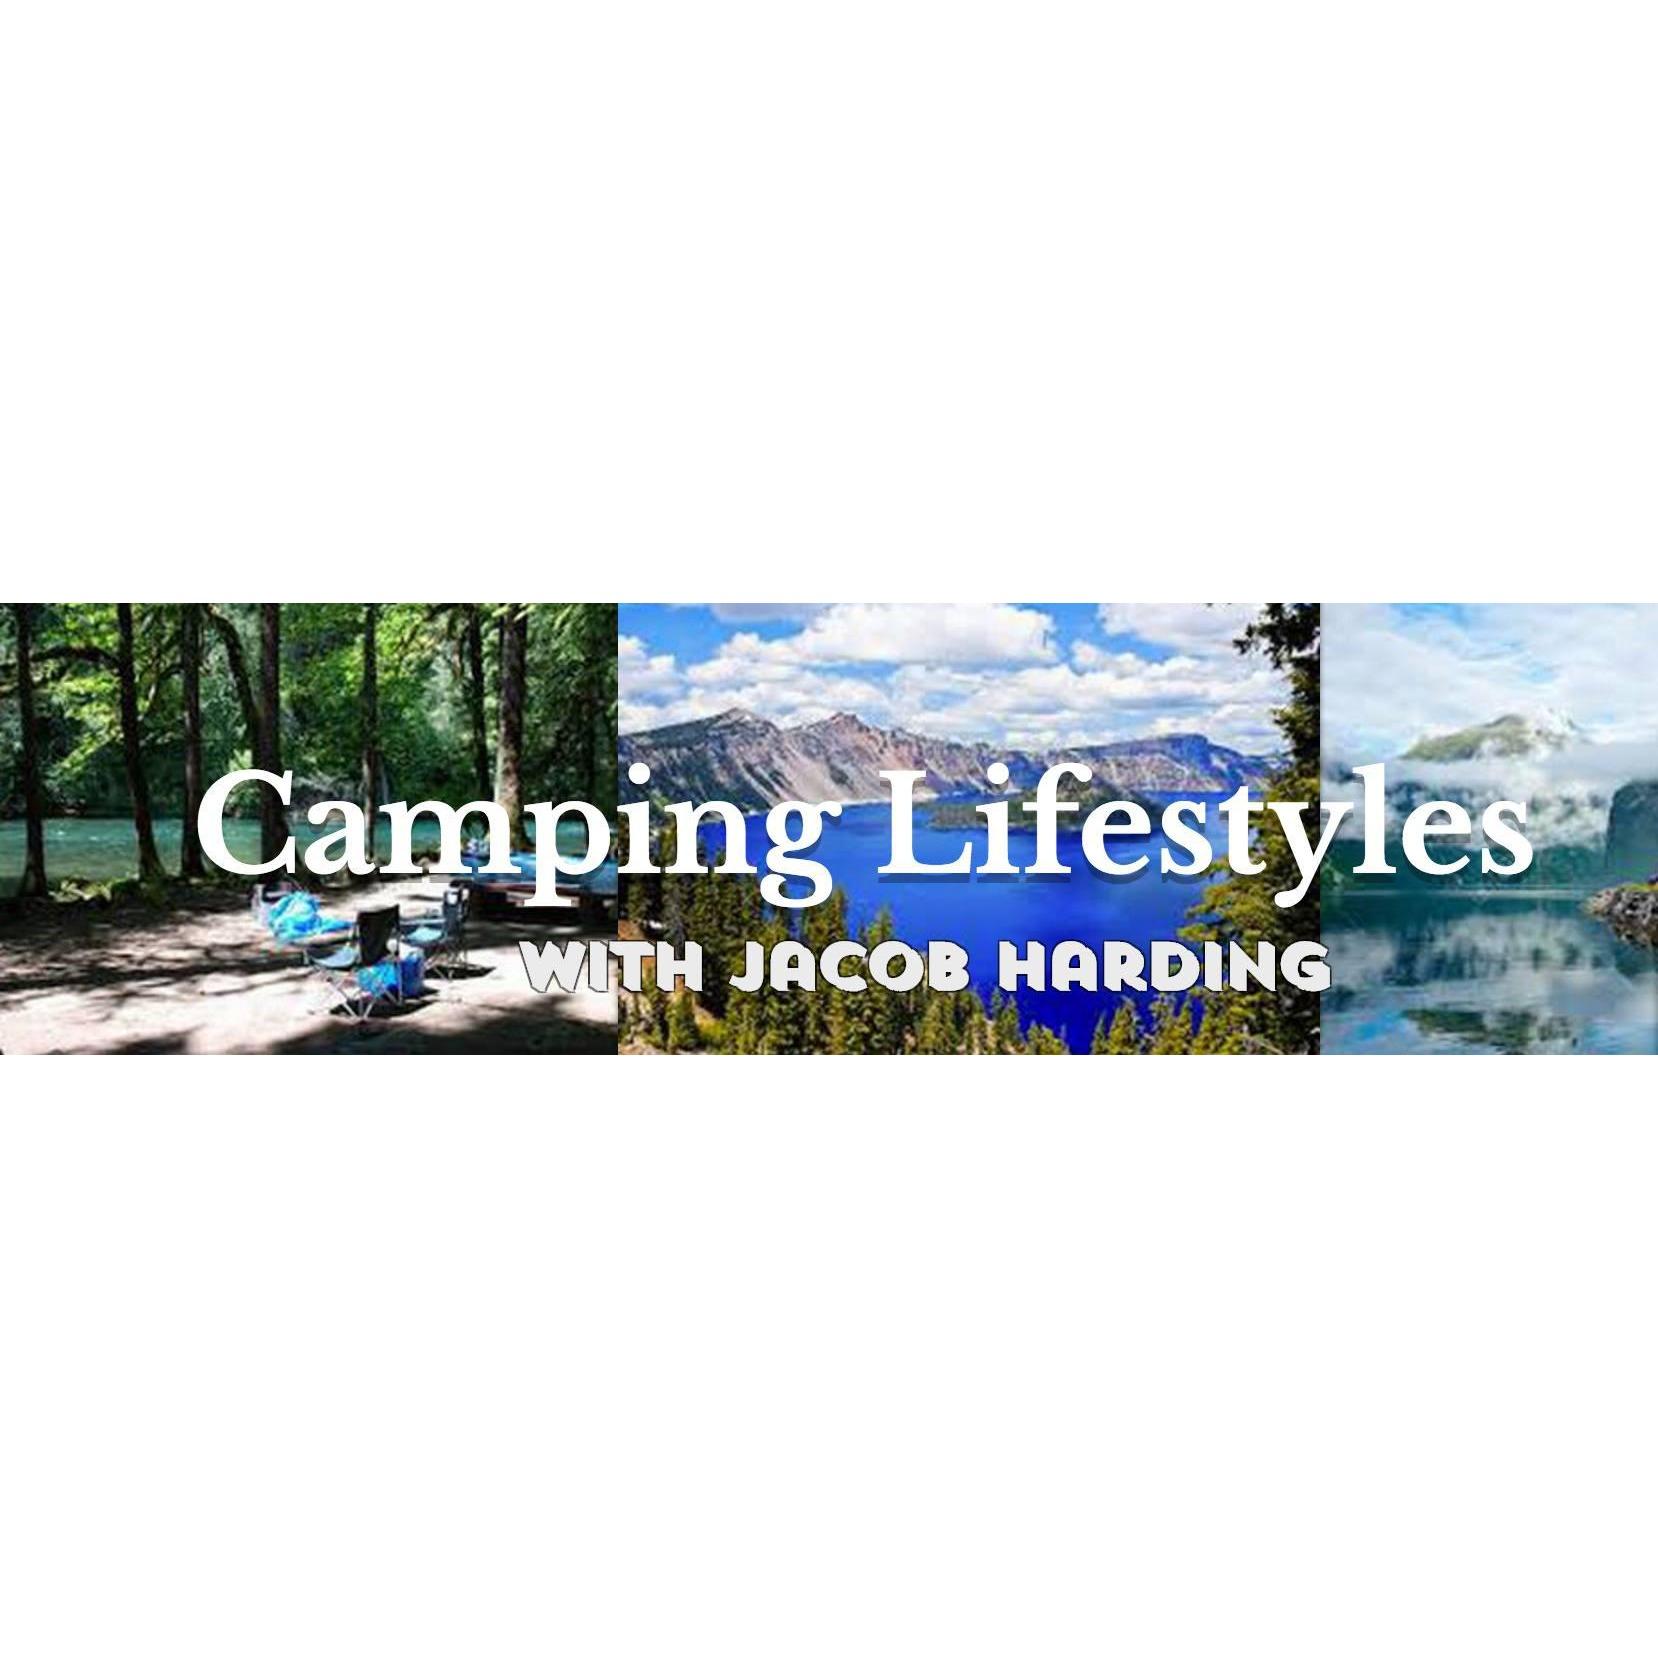 Camping Lifestyles - Aliso Viejo, CA 92656 - (949)903-5253 | ShowMeLocal.com